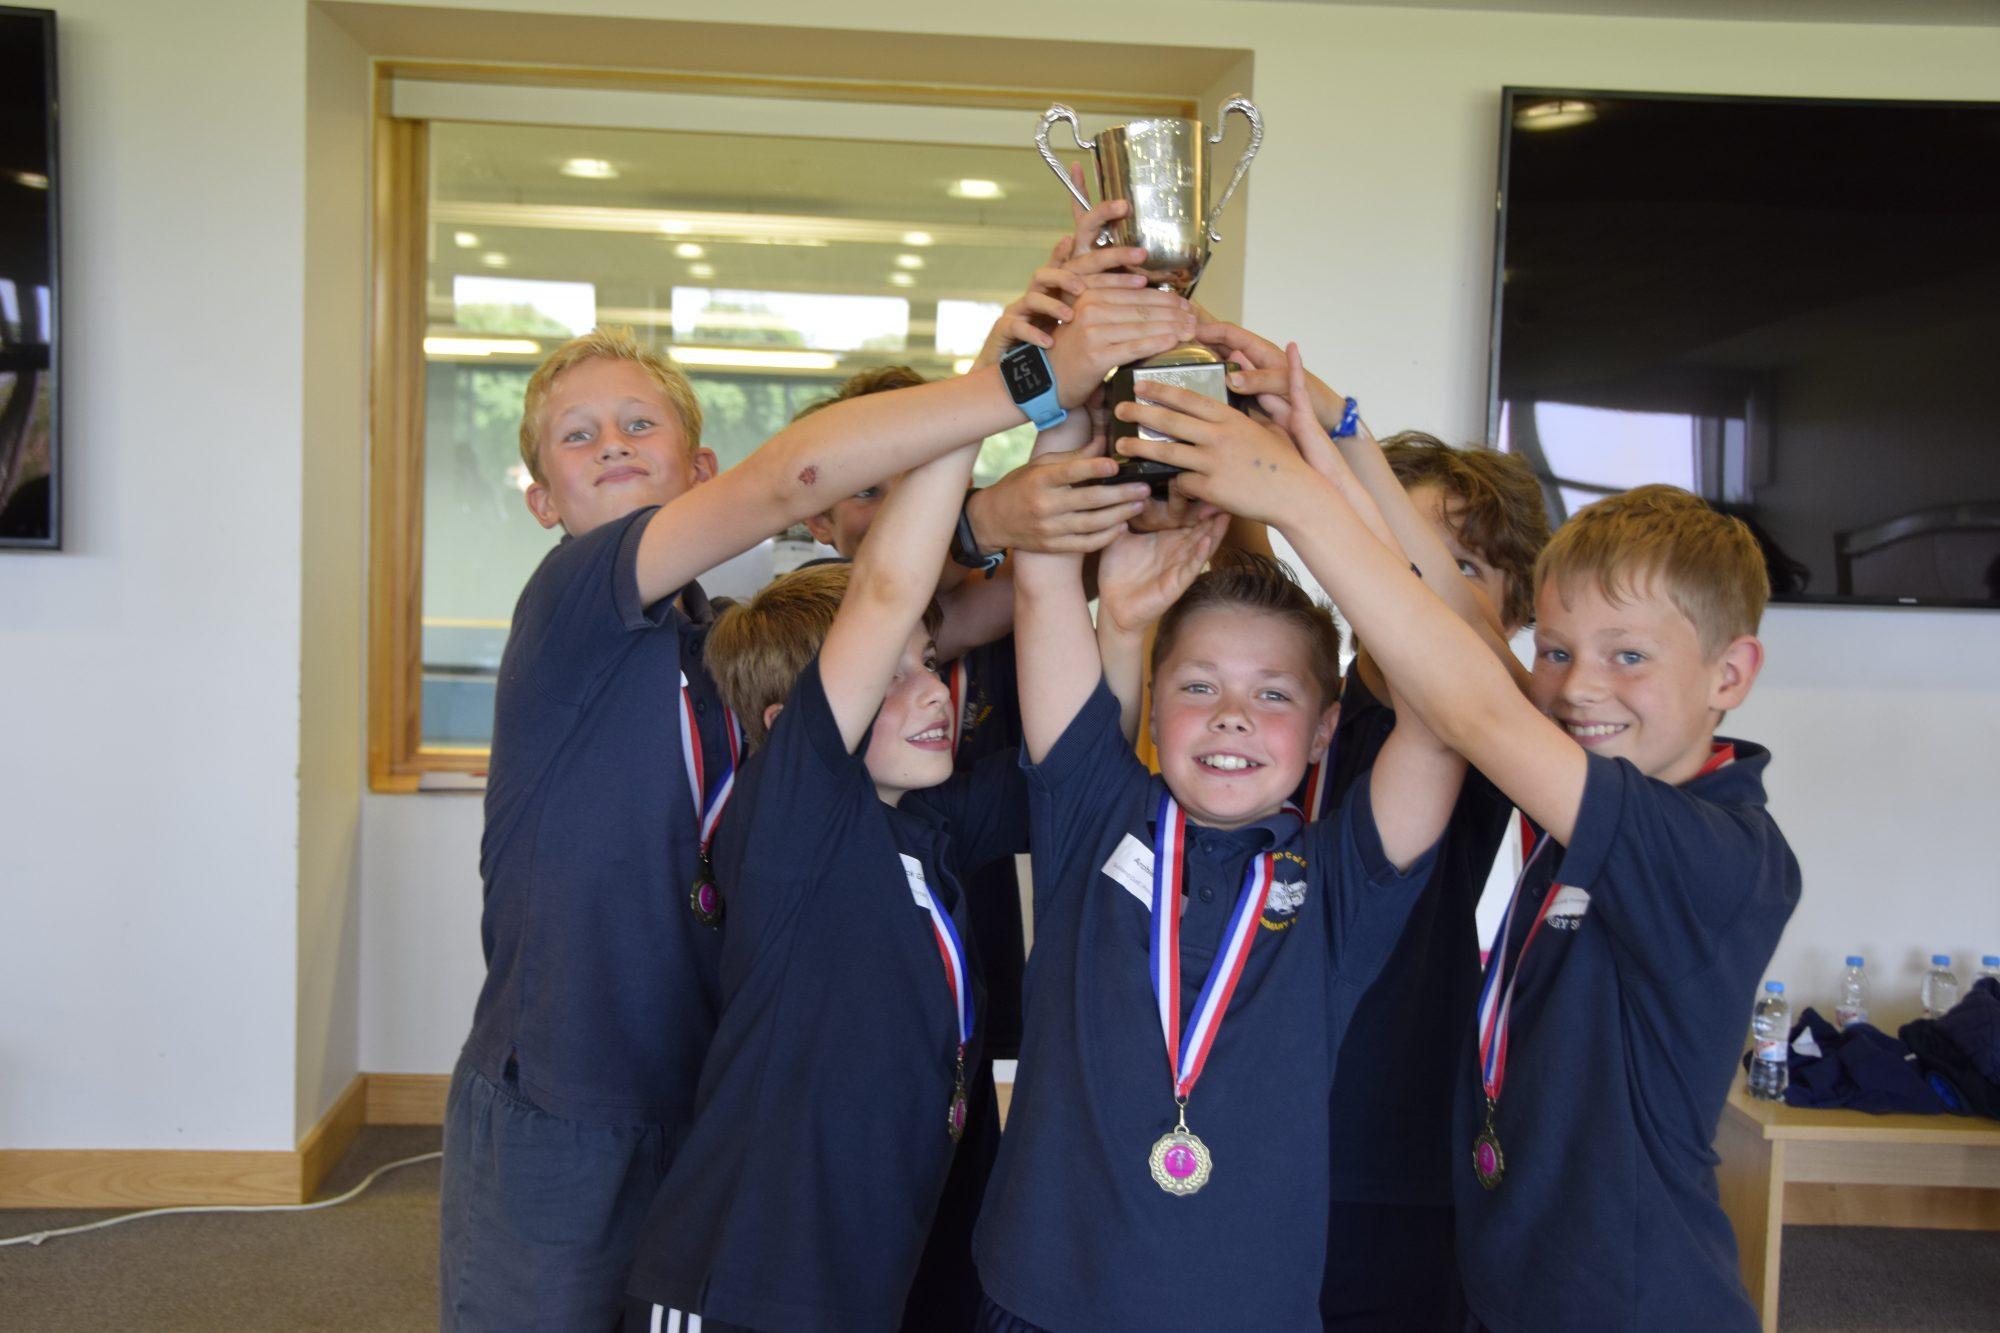 Abingdon School in Partnership sports event